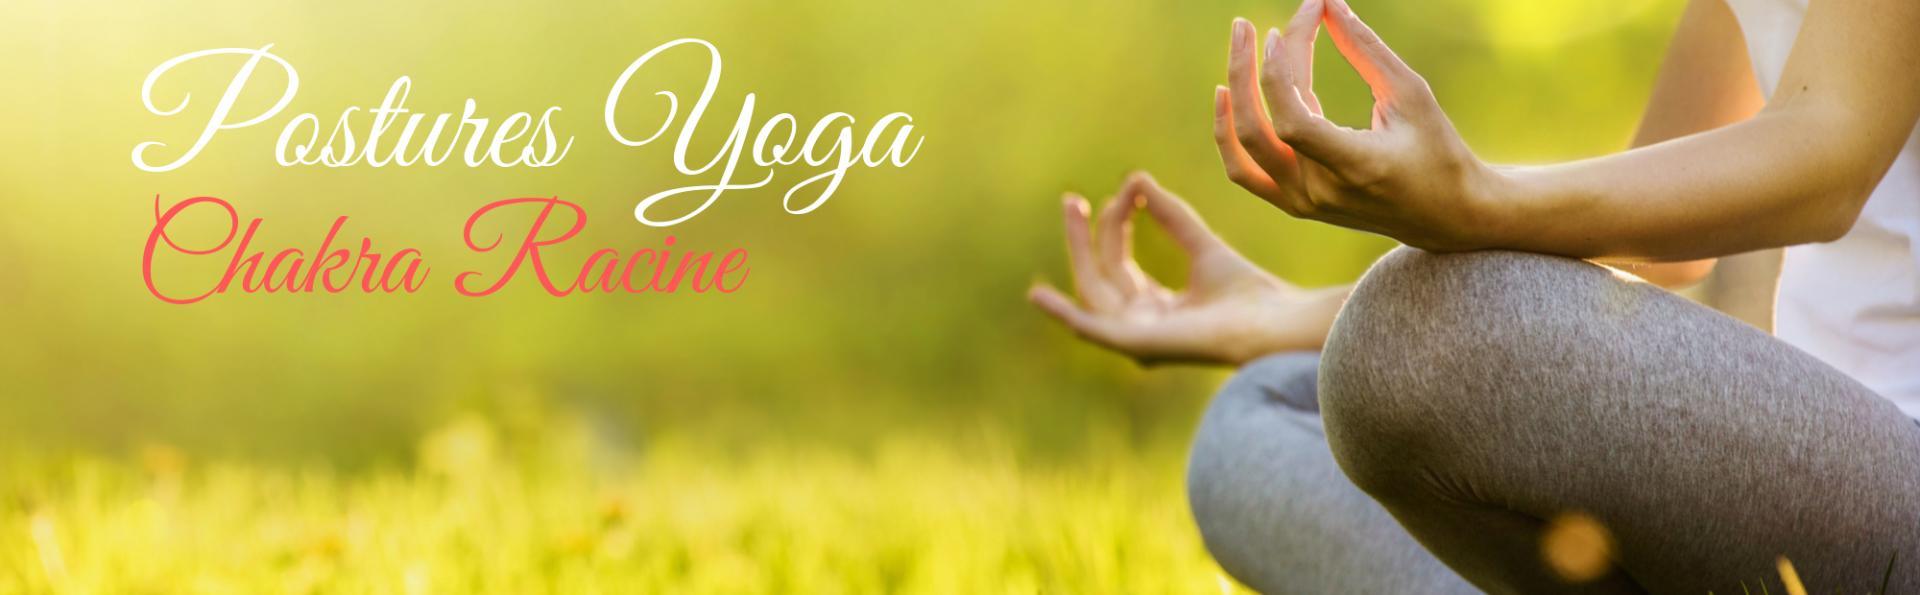 Postures yoga chakra racine sandrine fleur b